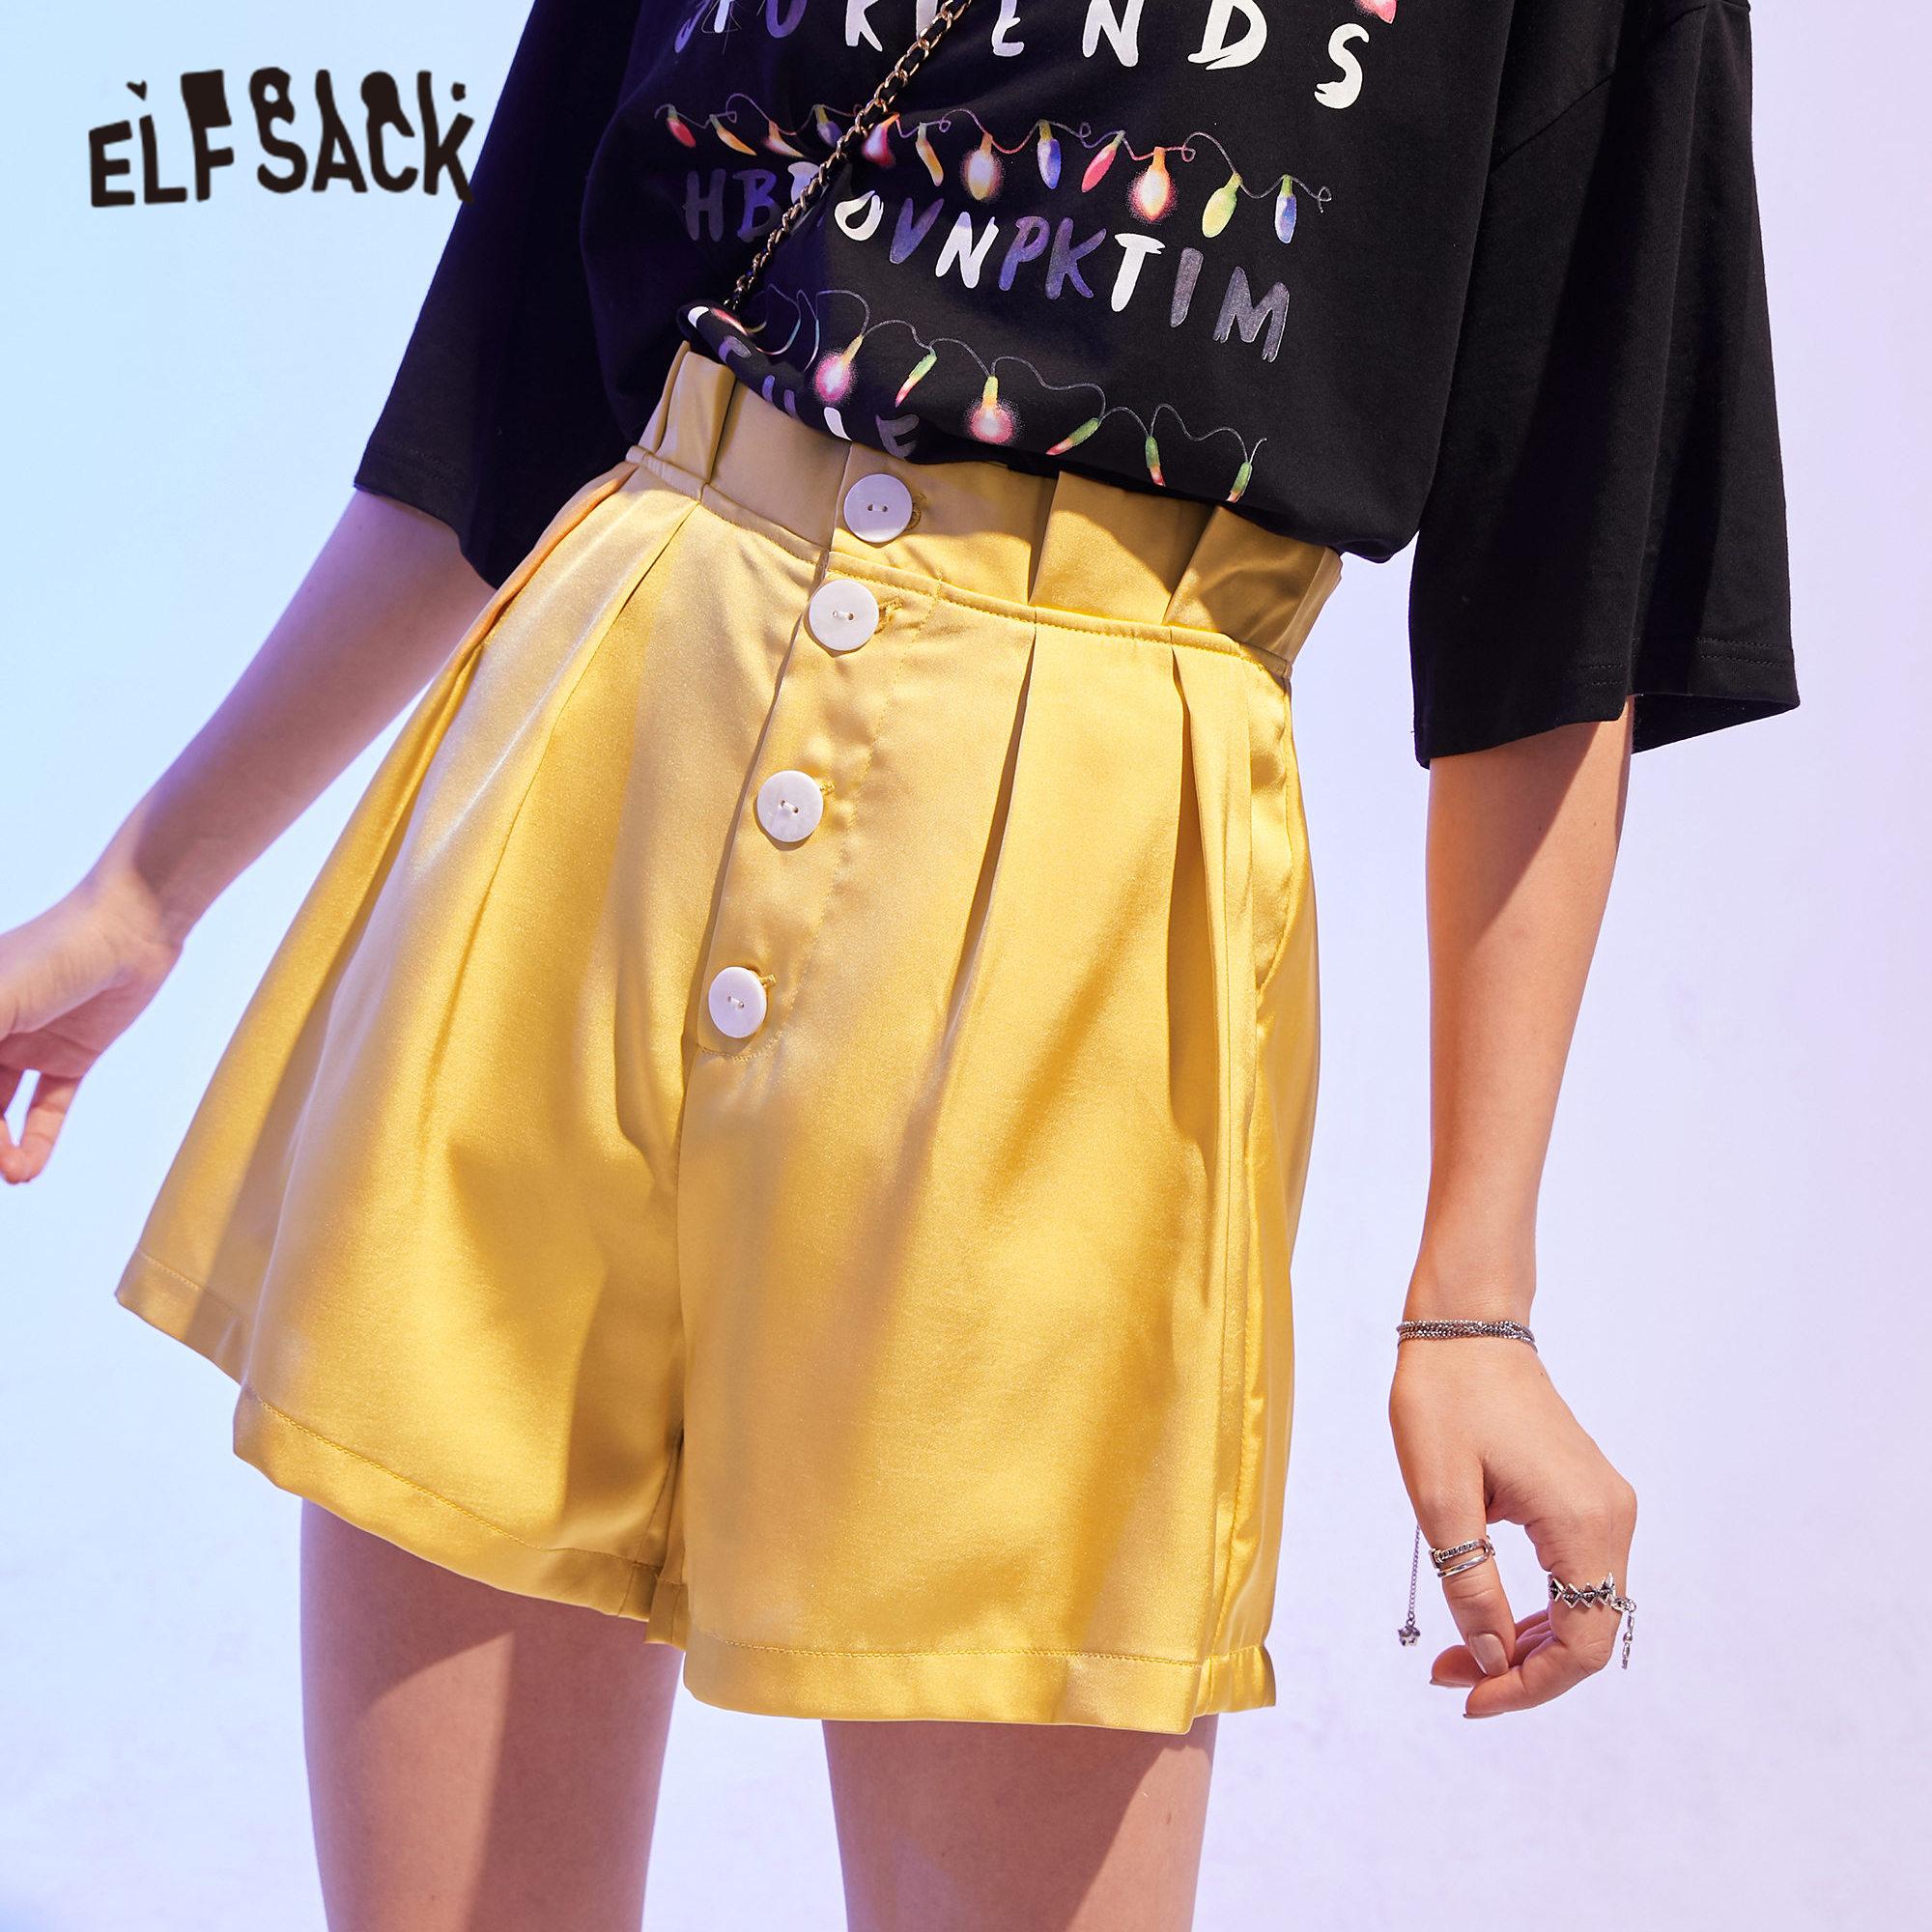 ELFSACK amarillo sólido alto cintura inteligente Casual mujeres satén pantalones cortos 2020 verano ELF Pure Chic botón coreano señoras diario Bottoms